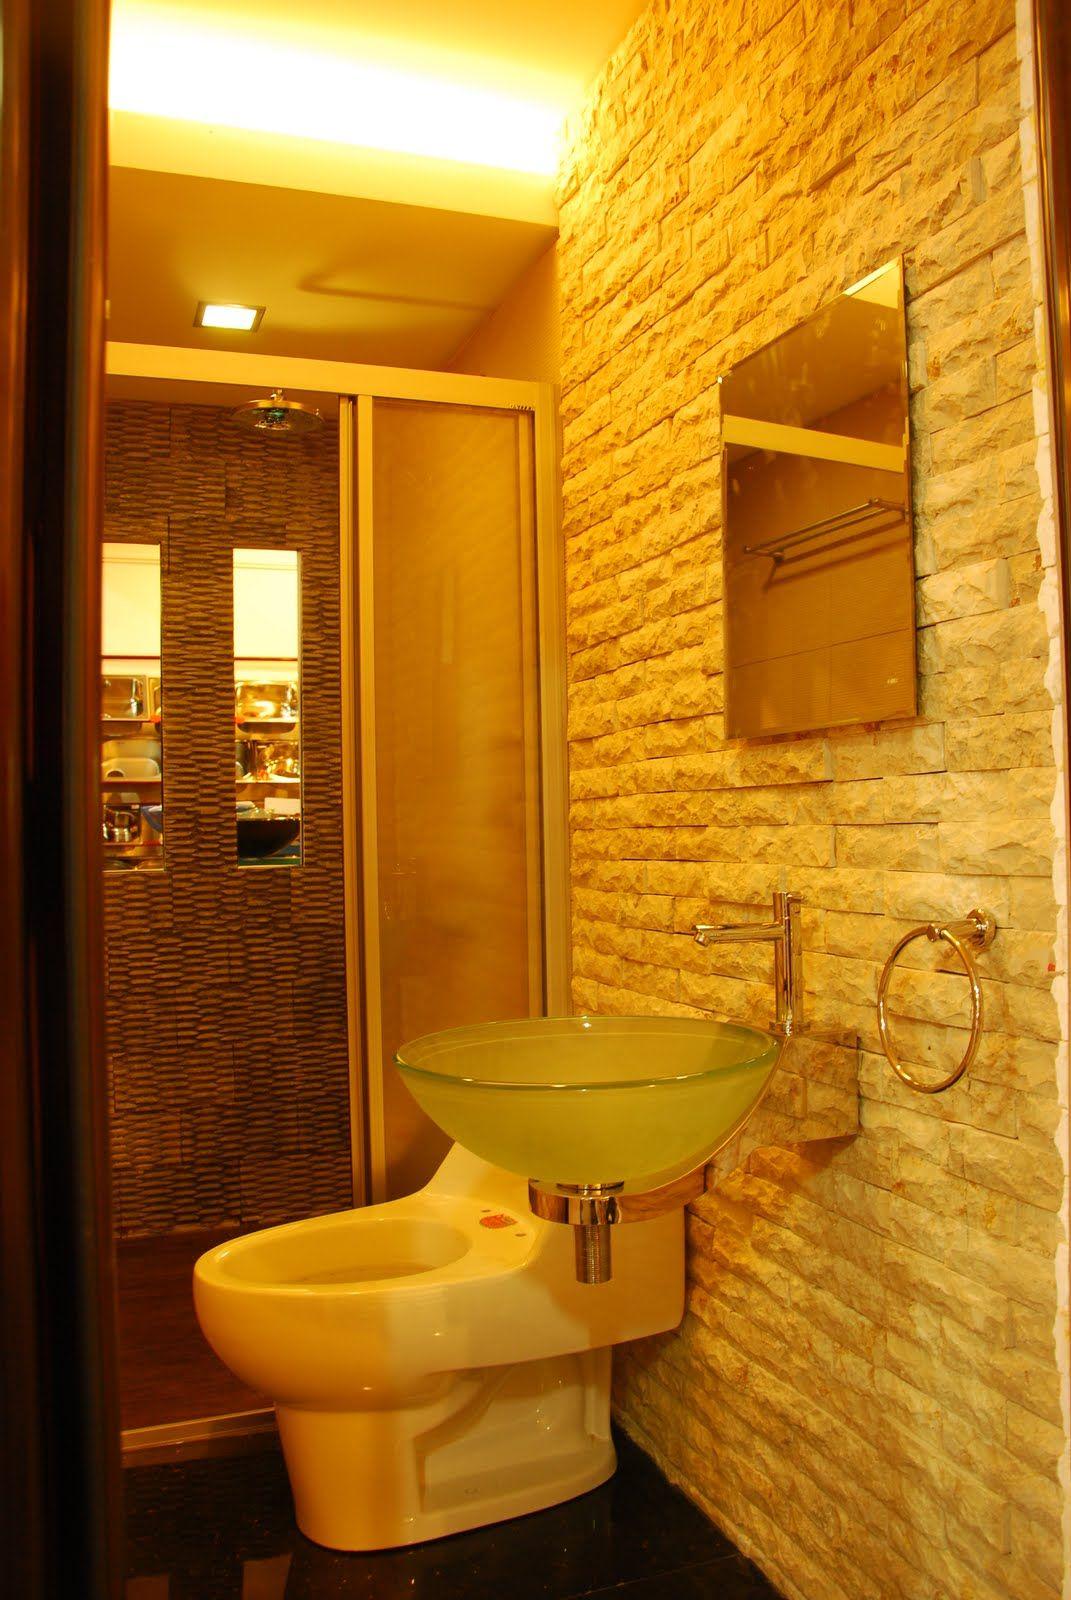 25 Amazing Tropical Bathroom Design Ideas Decoration Love 42 Amazing Tropical Bathroom Dcor As Digsd Bathroom Design Bathroom Decor Glamorous Bathroom Decor Viral home designer bathroom design